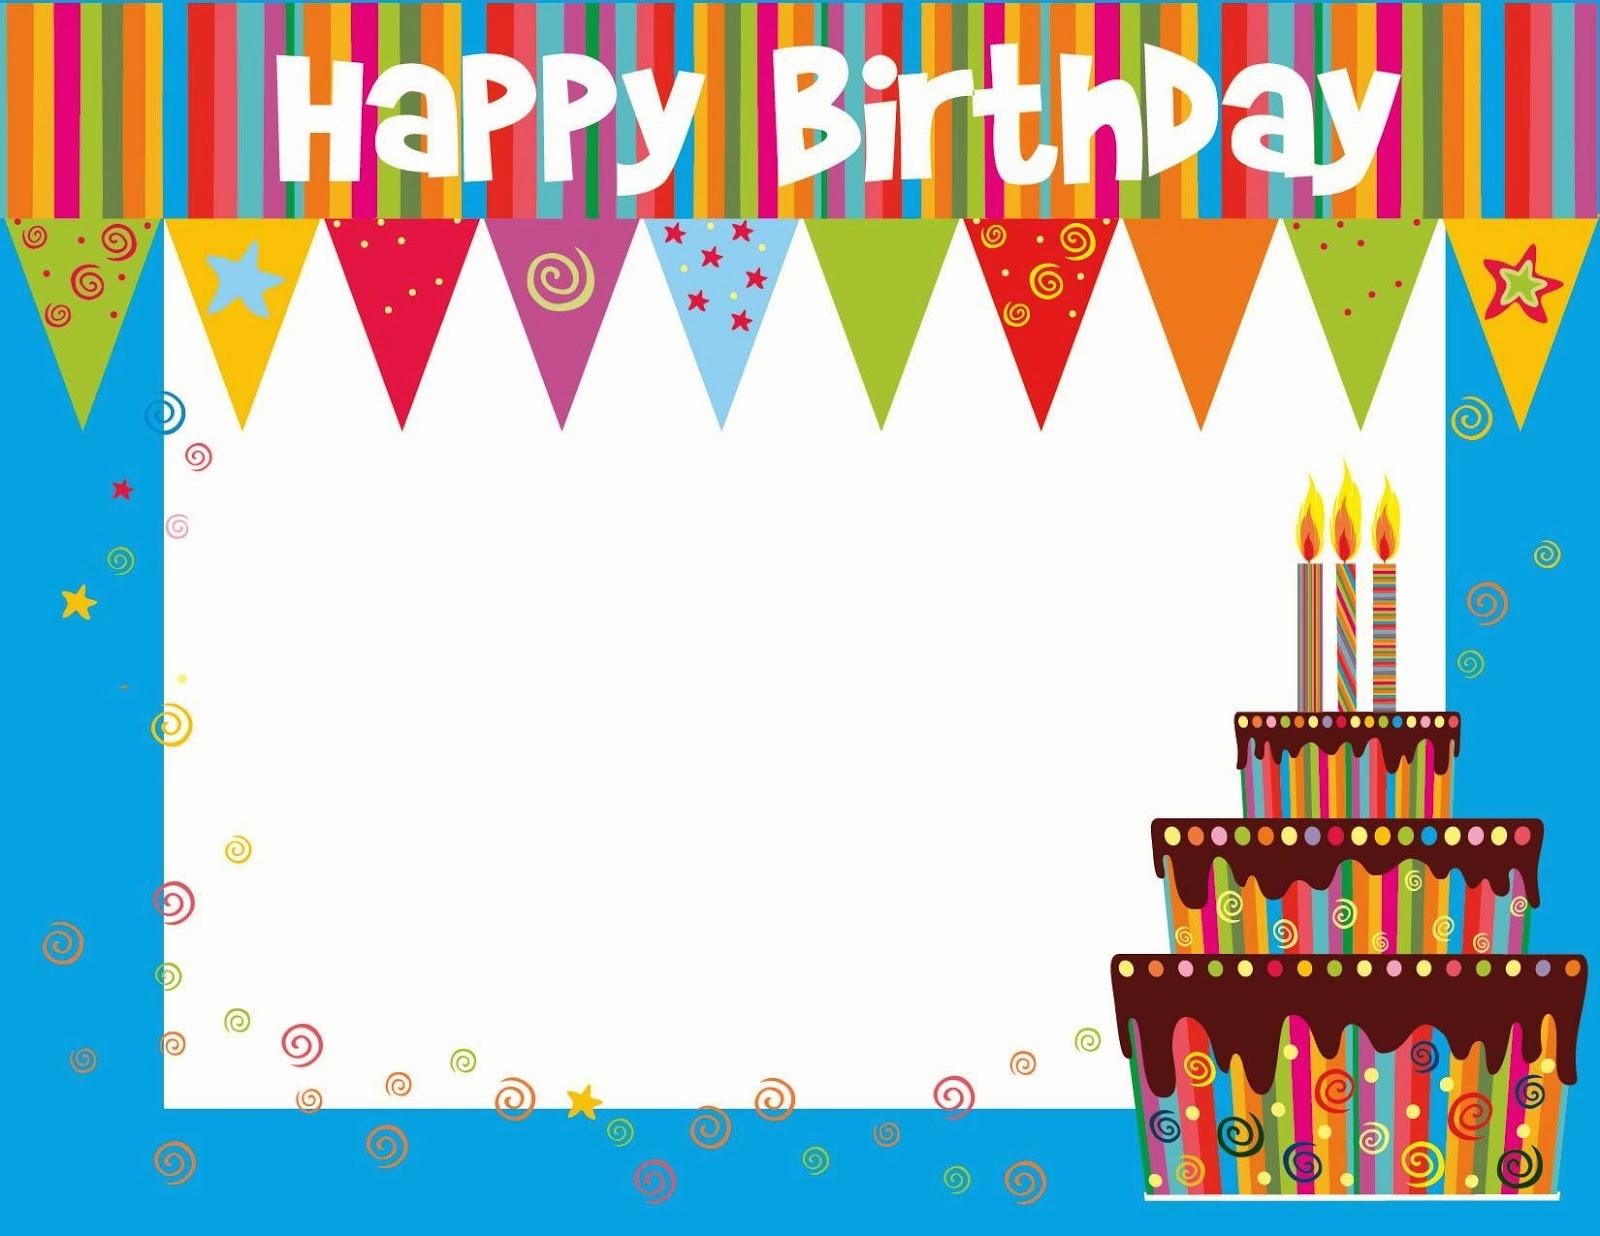 Hallmark Big Birthday Cards Inspirational Inspirational Hallmark - Free Printable Hallmark Birthday Cards